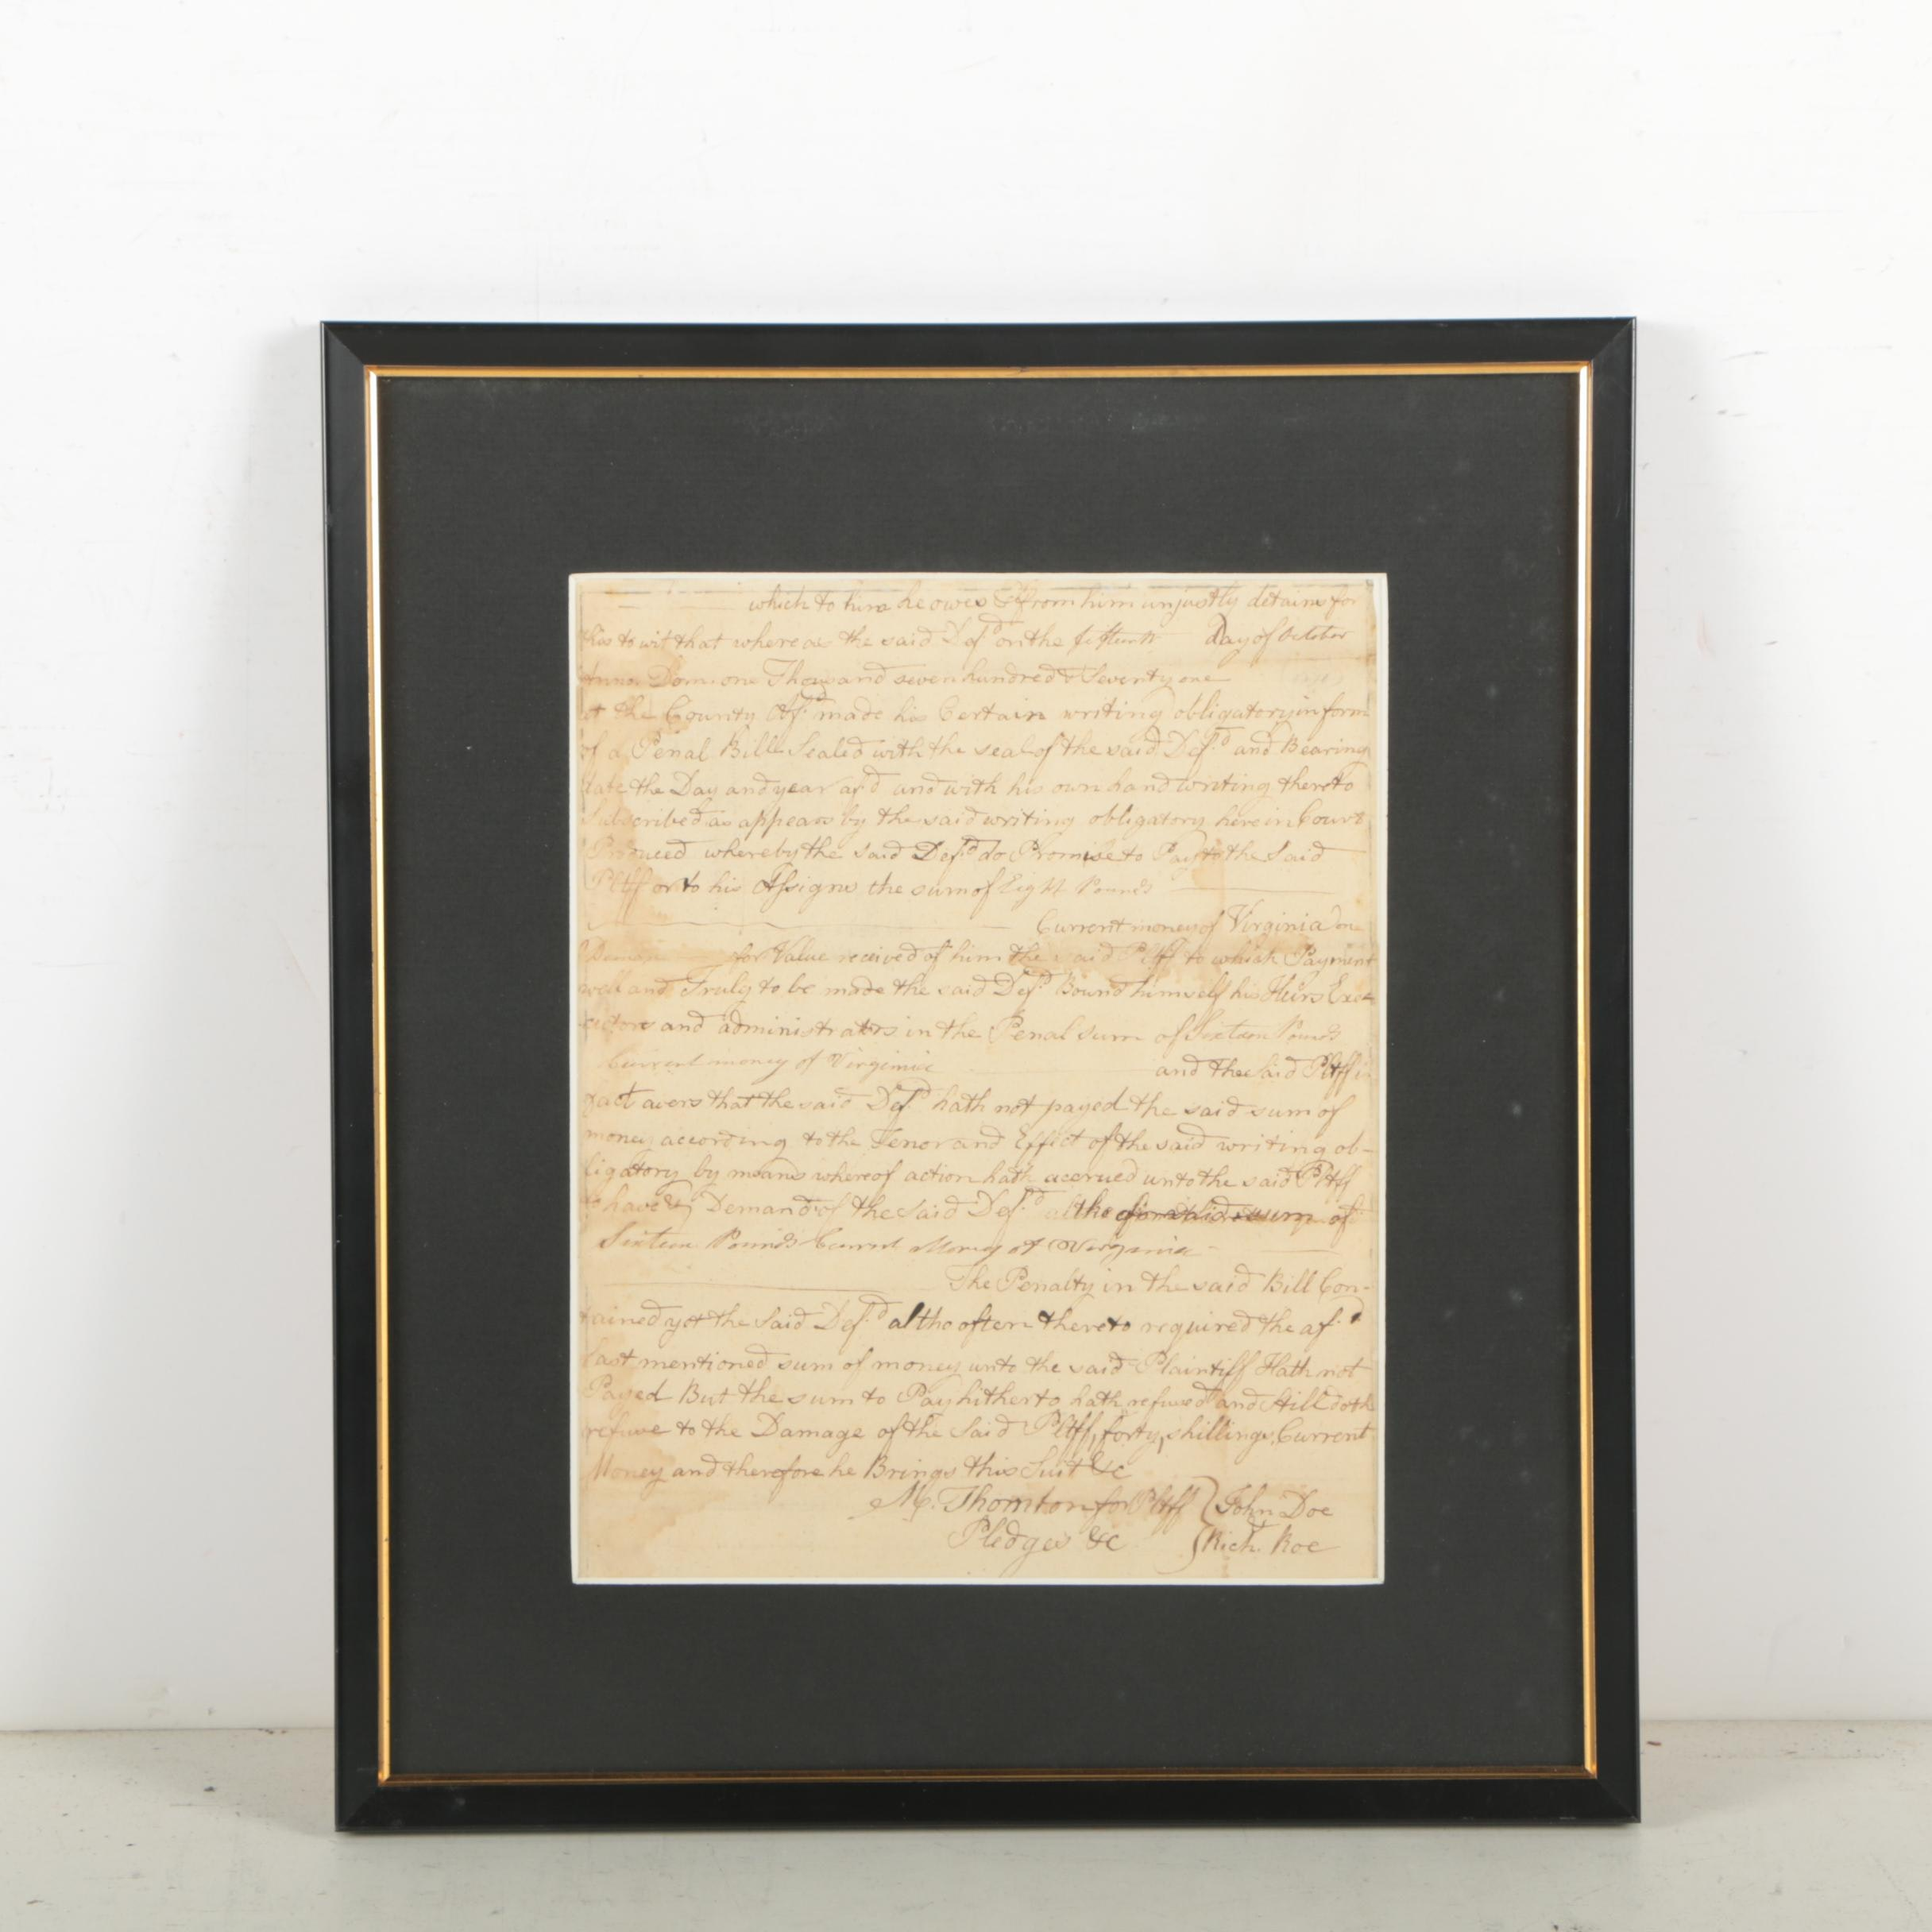 Matthew Thornton Document Signed Concerning Lawsuit